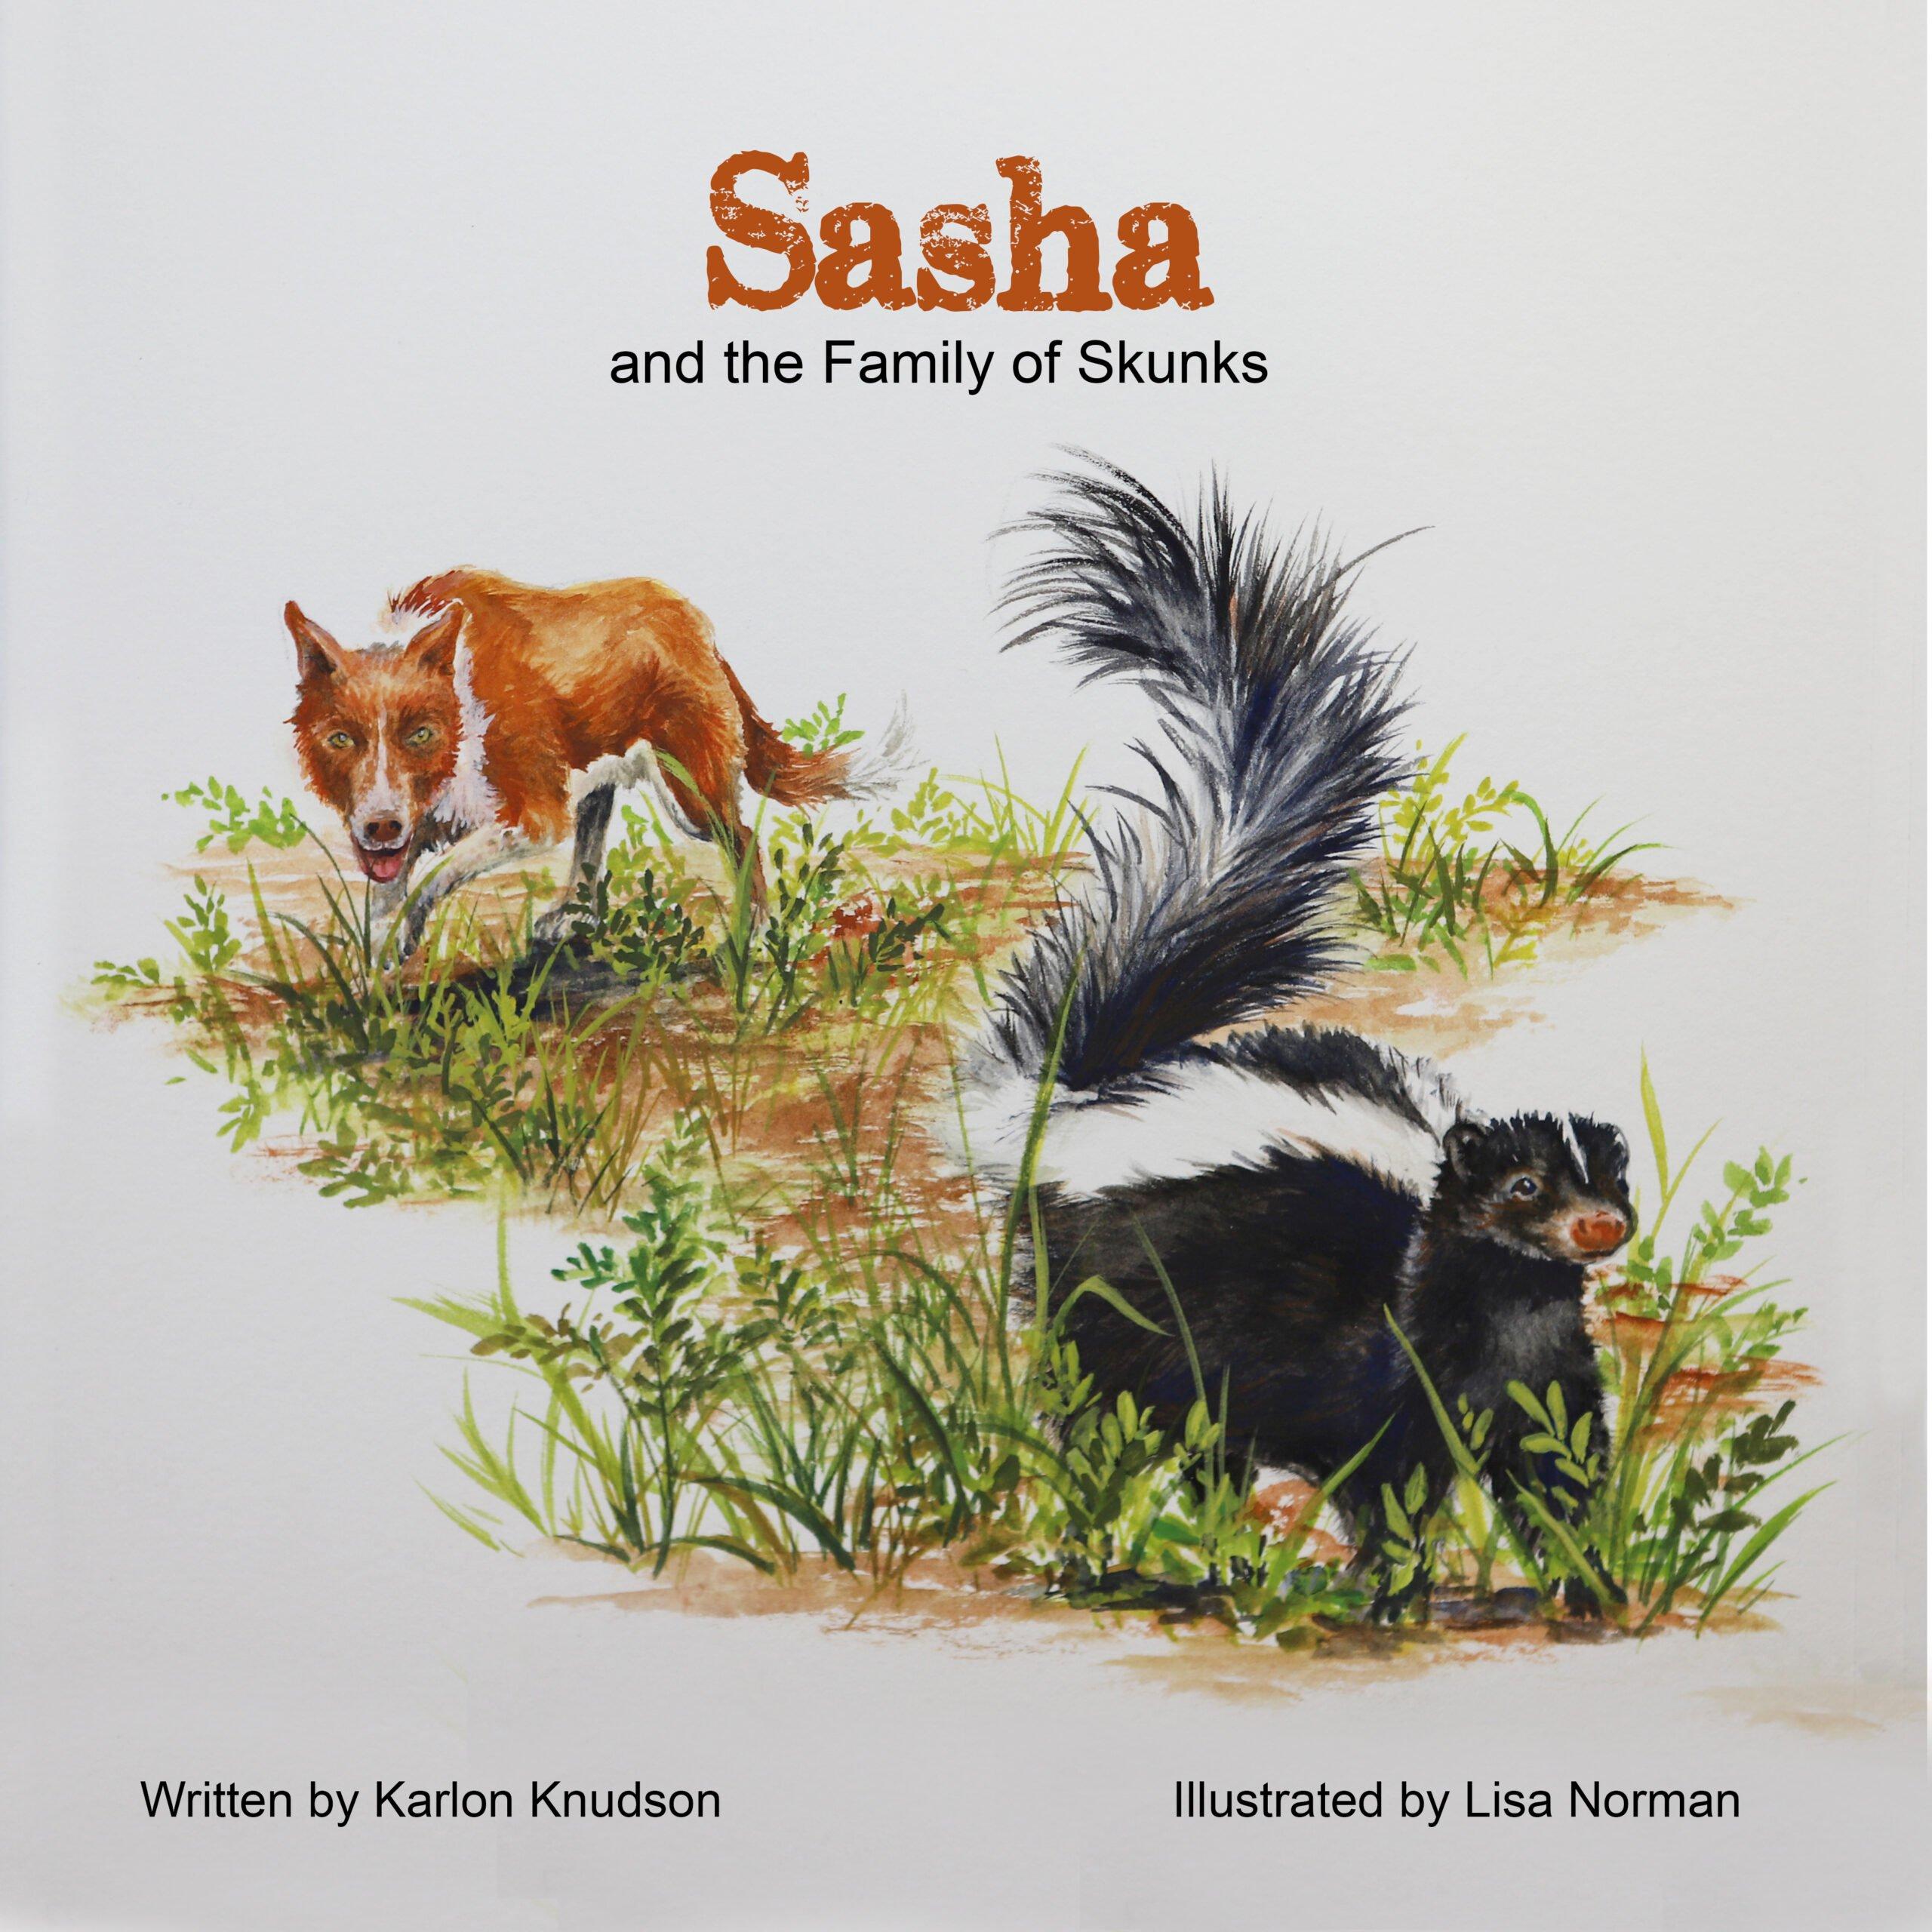 SashaSkunkCover